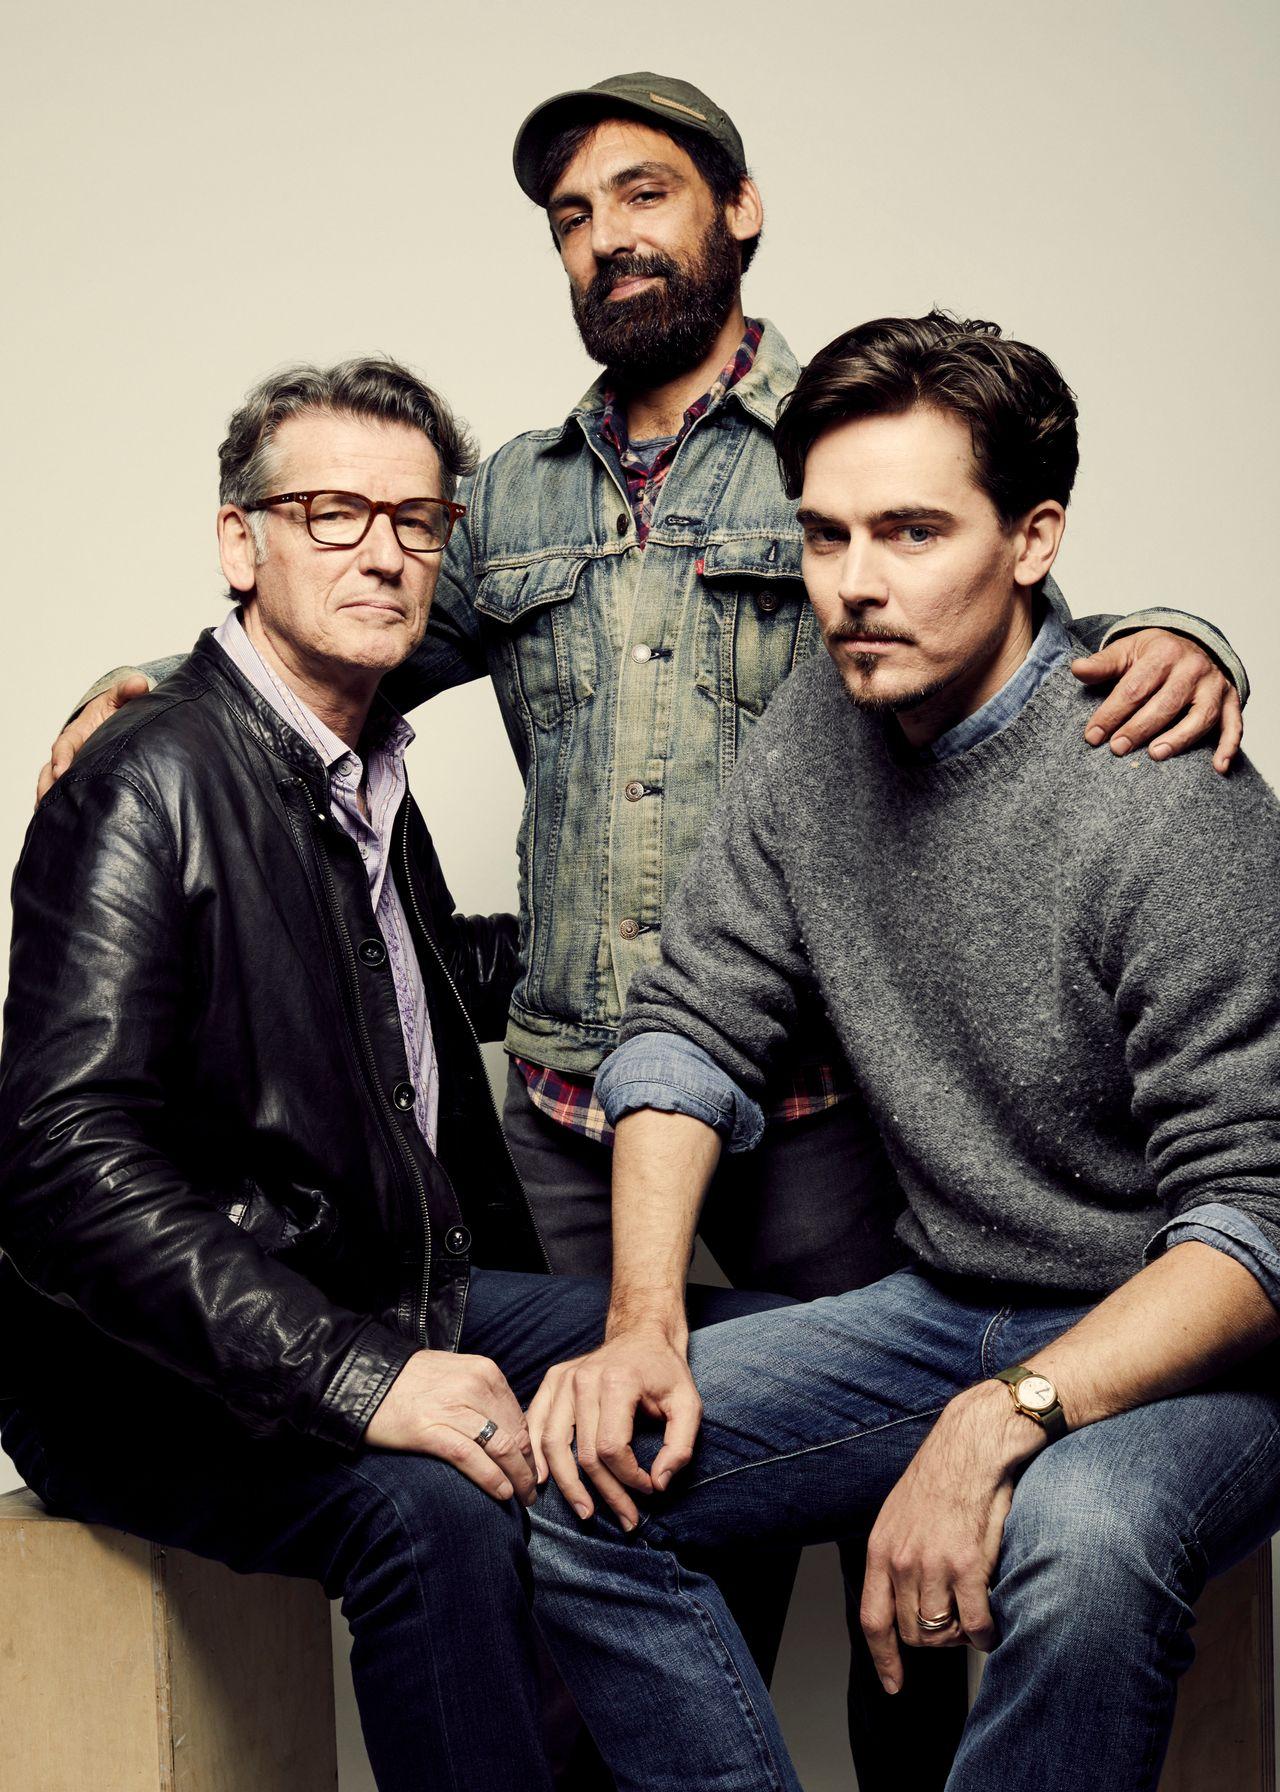 Derik Murray, Matt Amato and Adrian Buitenhuis from 'I Am Heath Ledger' pose at the 2017 Tribeca Film Festival portrait studio on April 24, 2017 in New York City.